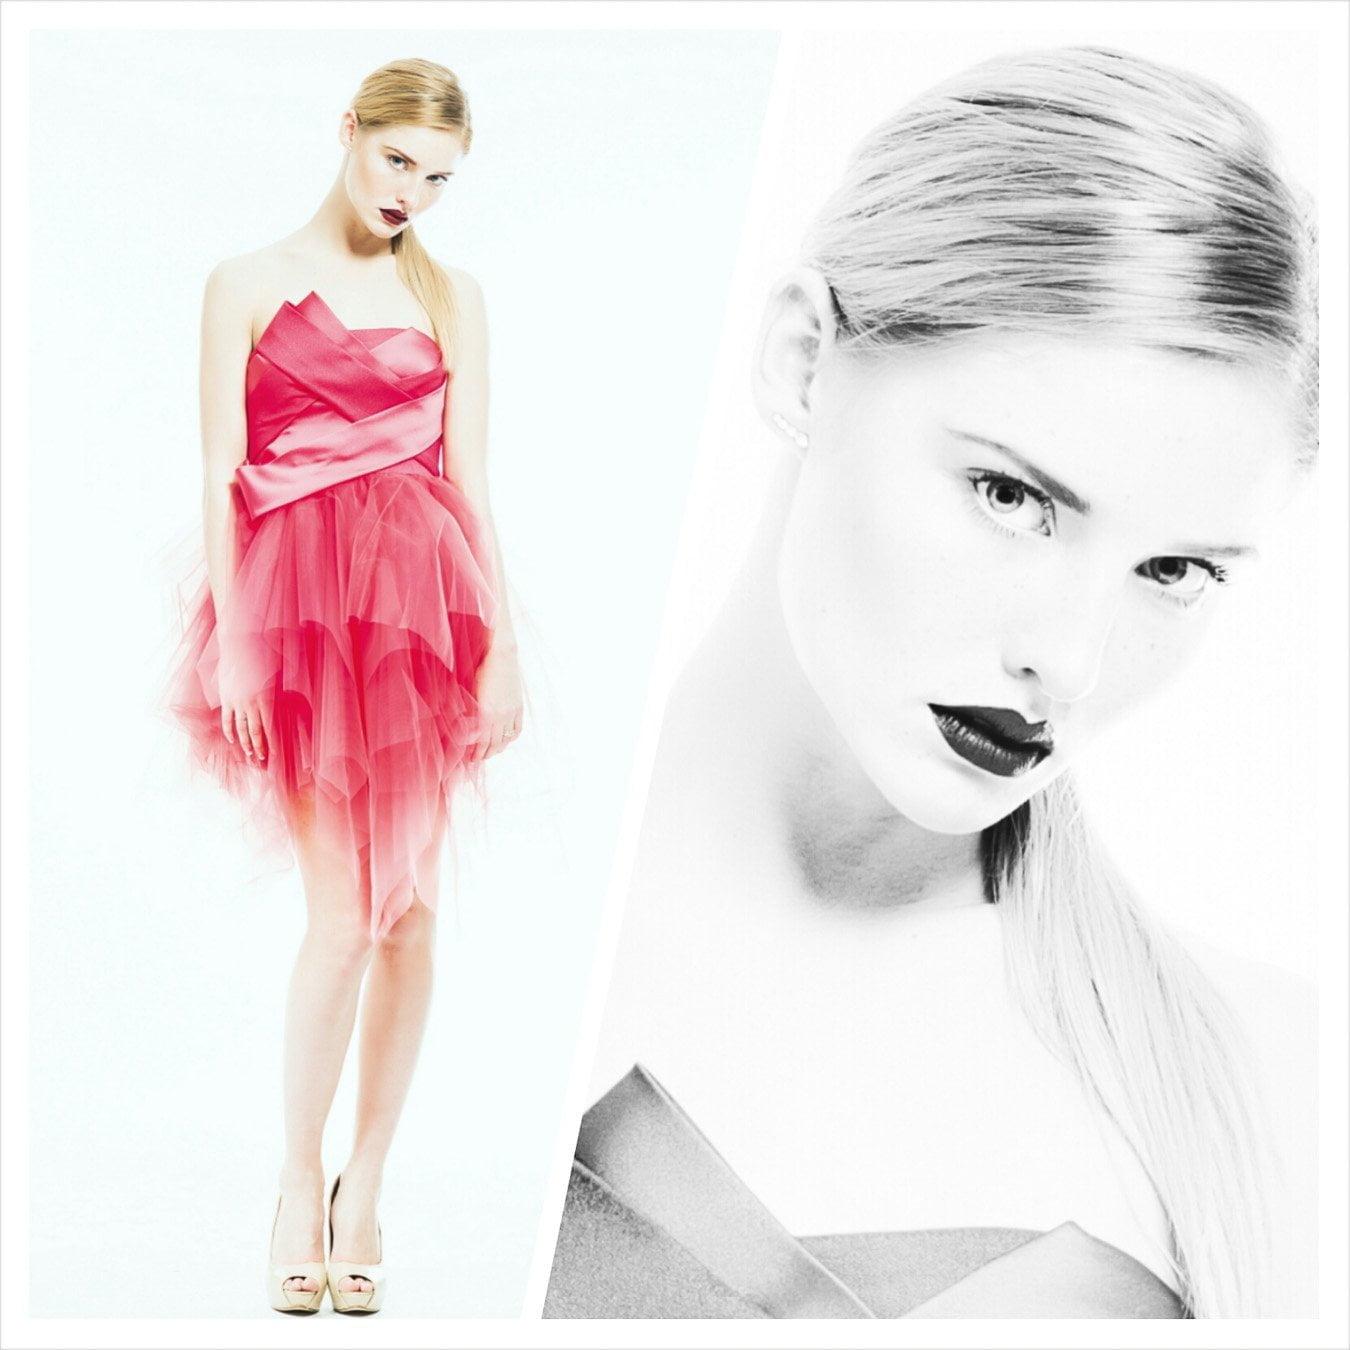 Moda Çekimi - Editorial - Beauty moda tekstil burakbulutfotografatolyesi 1